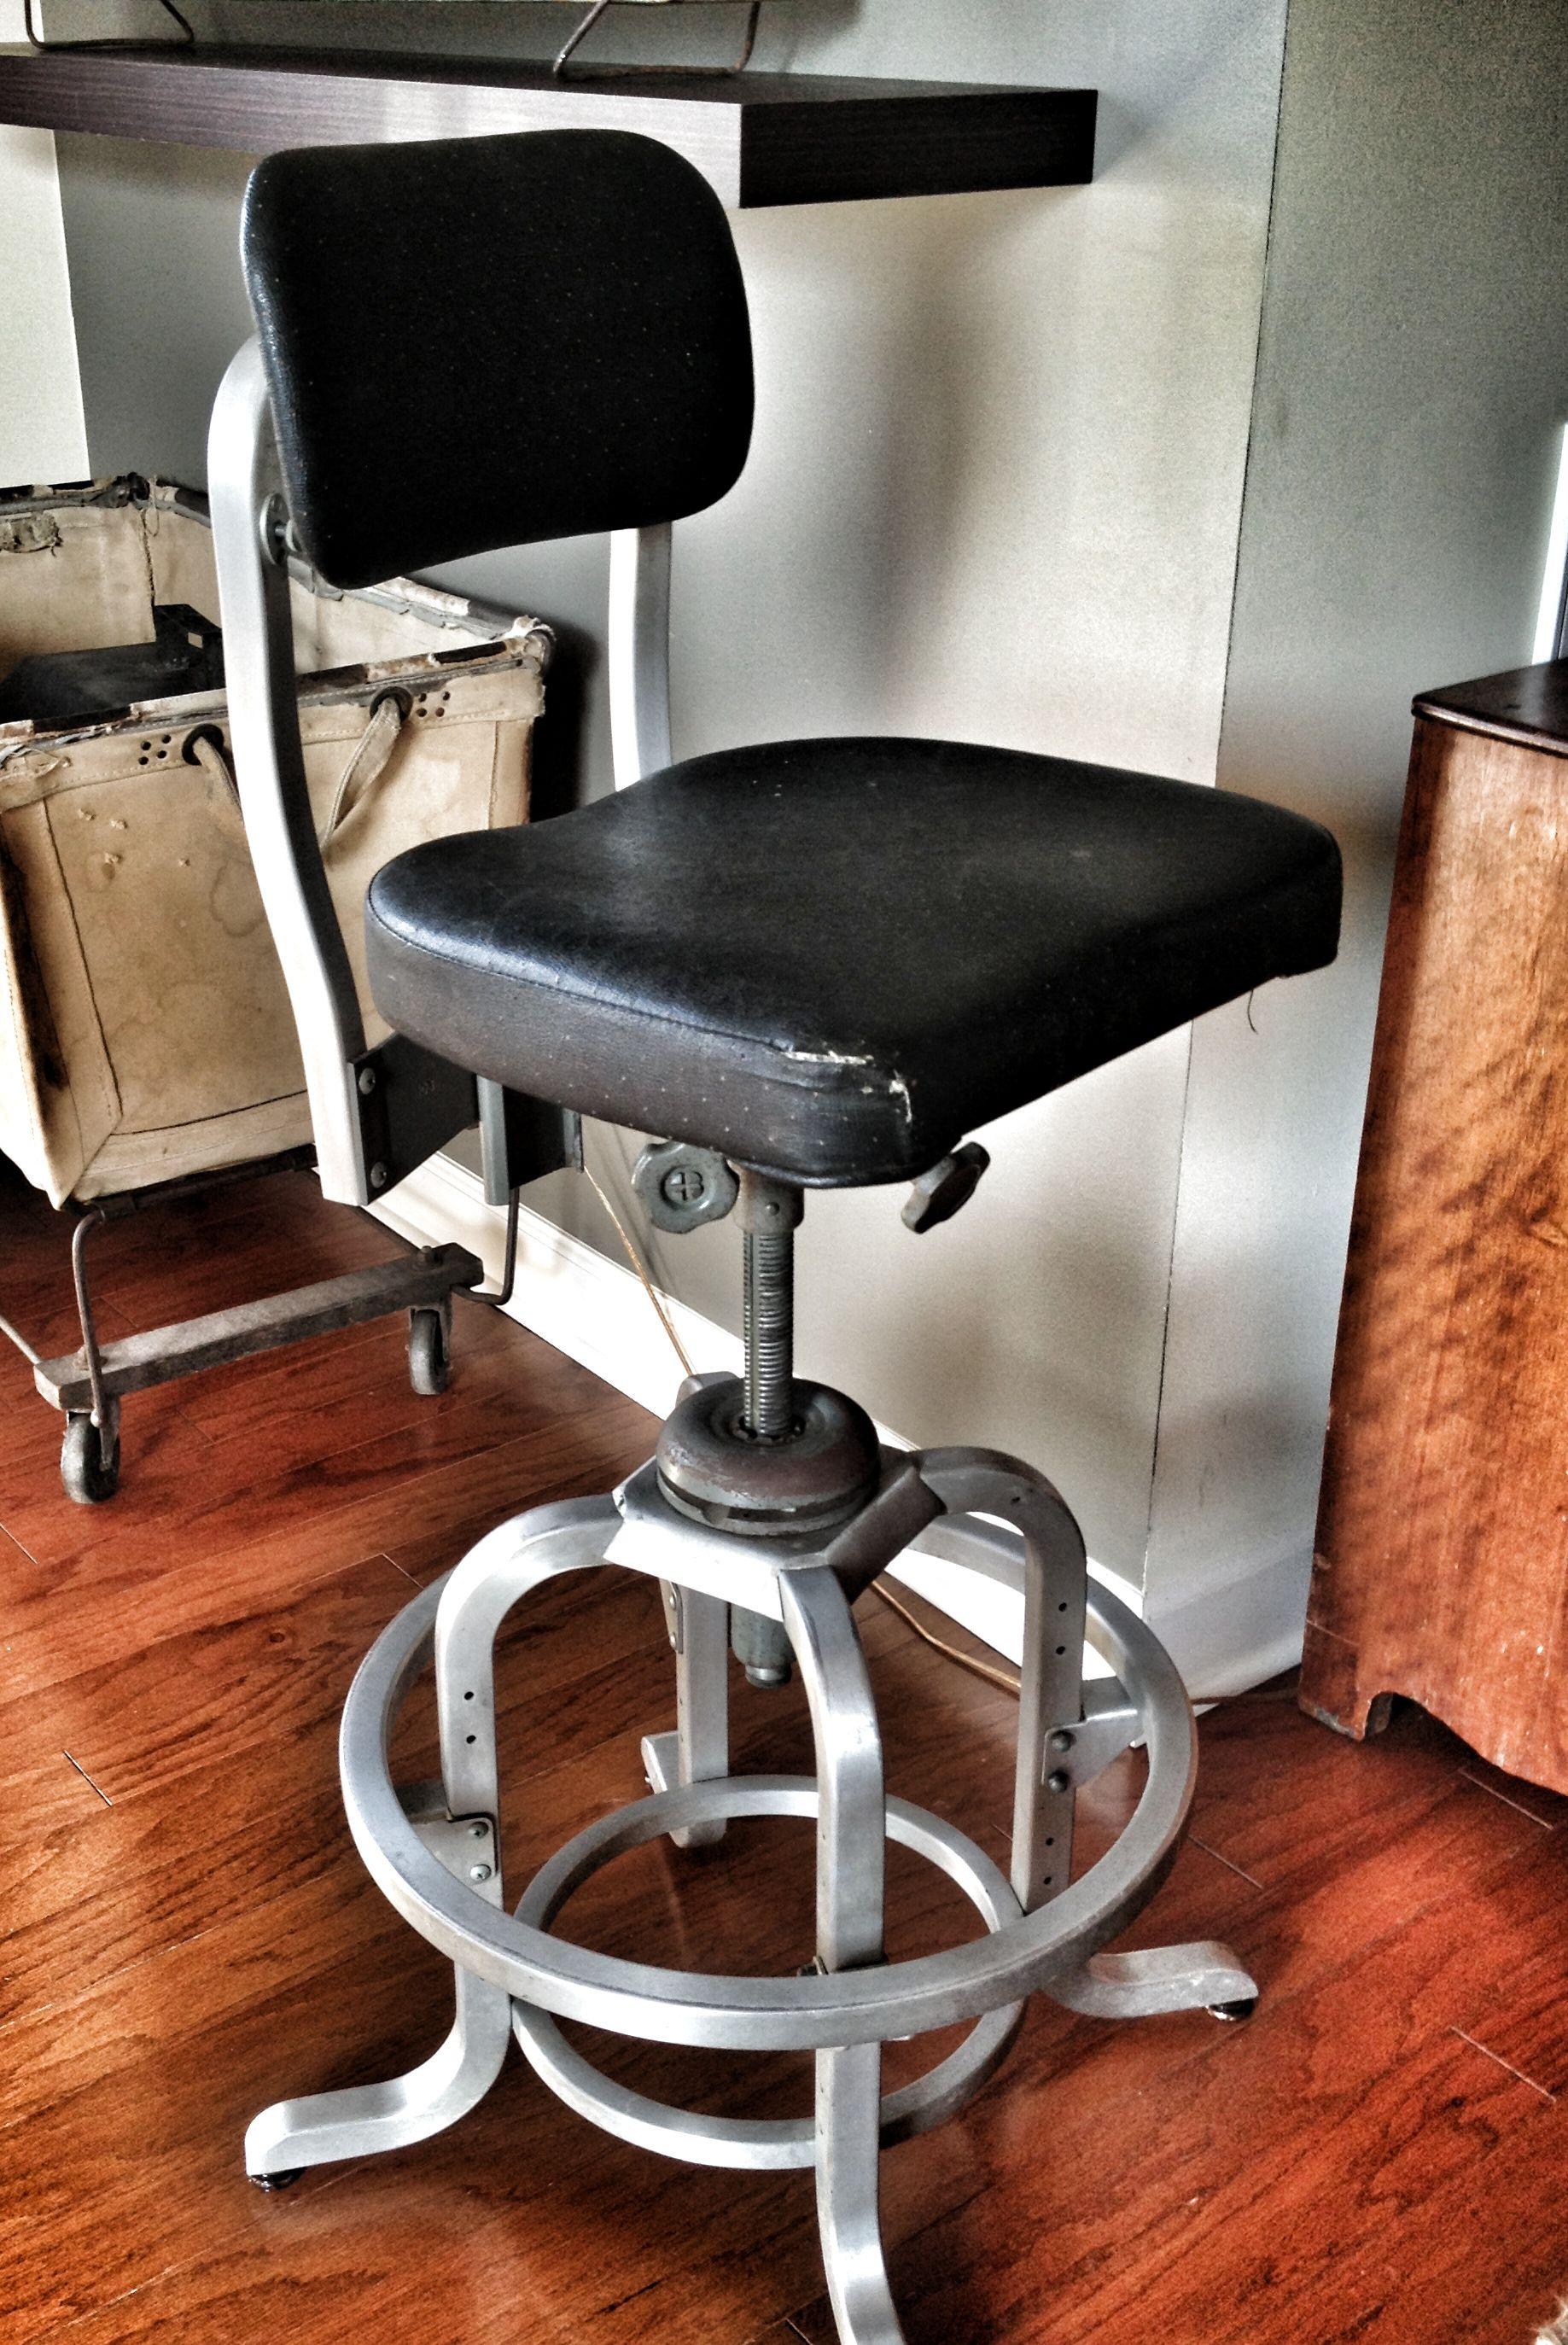 Wonderful industrial Good Form aluminum drafting stool